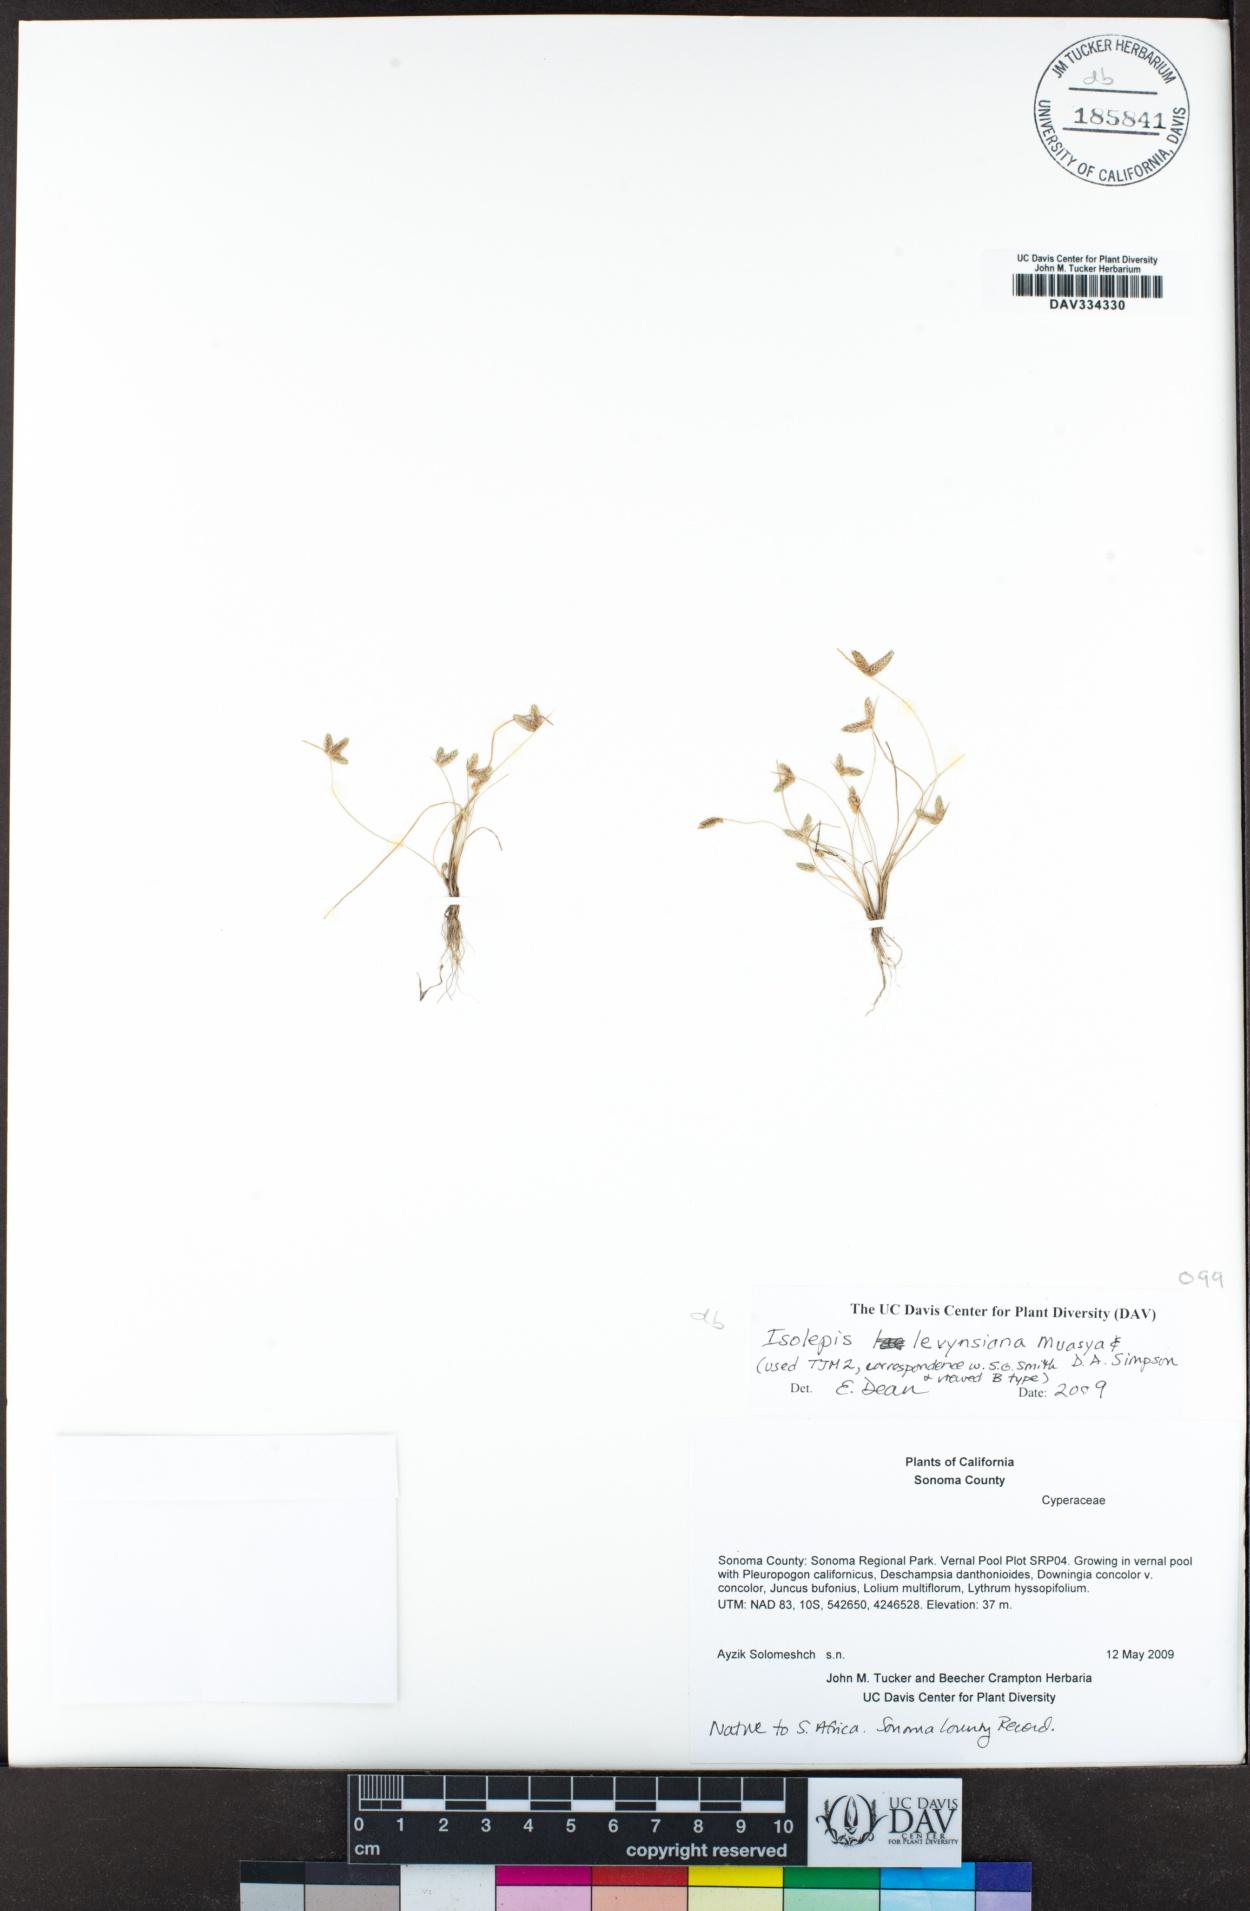 Isolepis levynsiana image